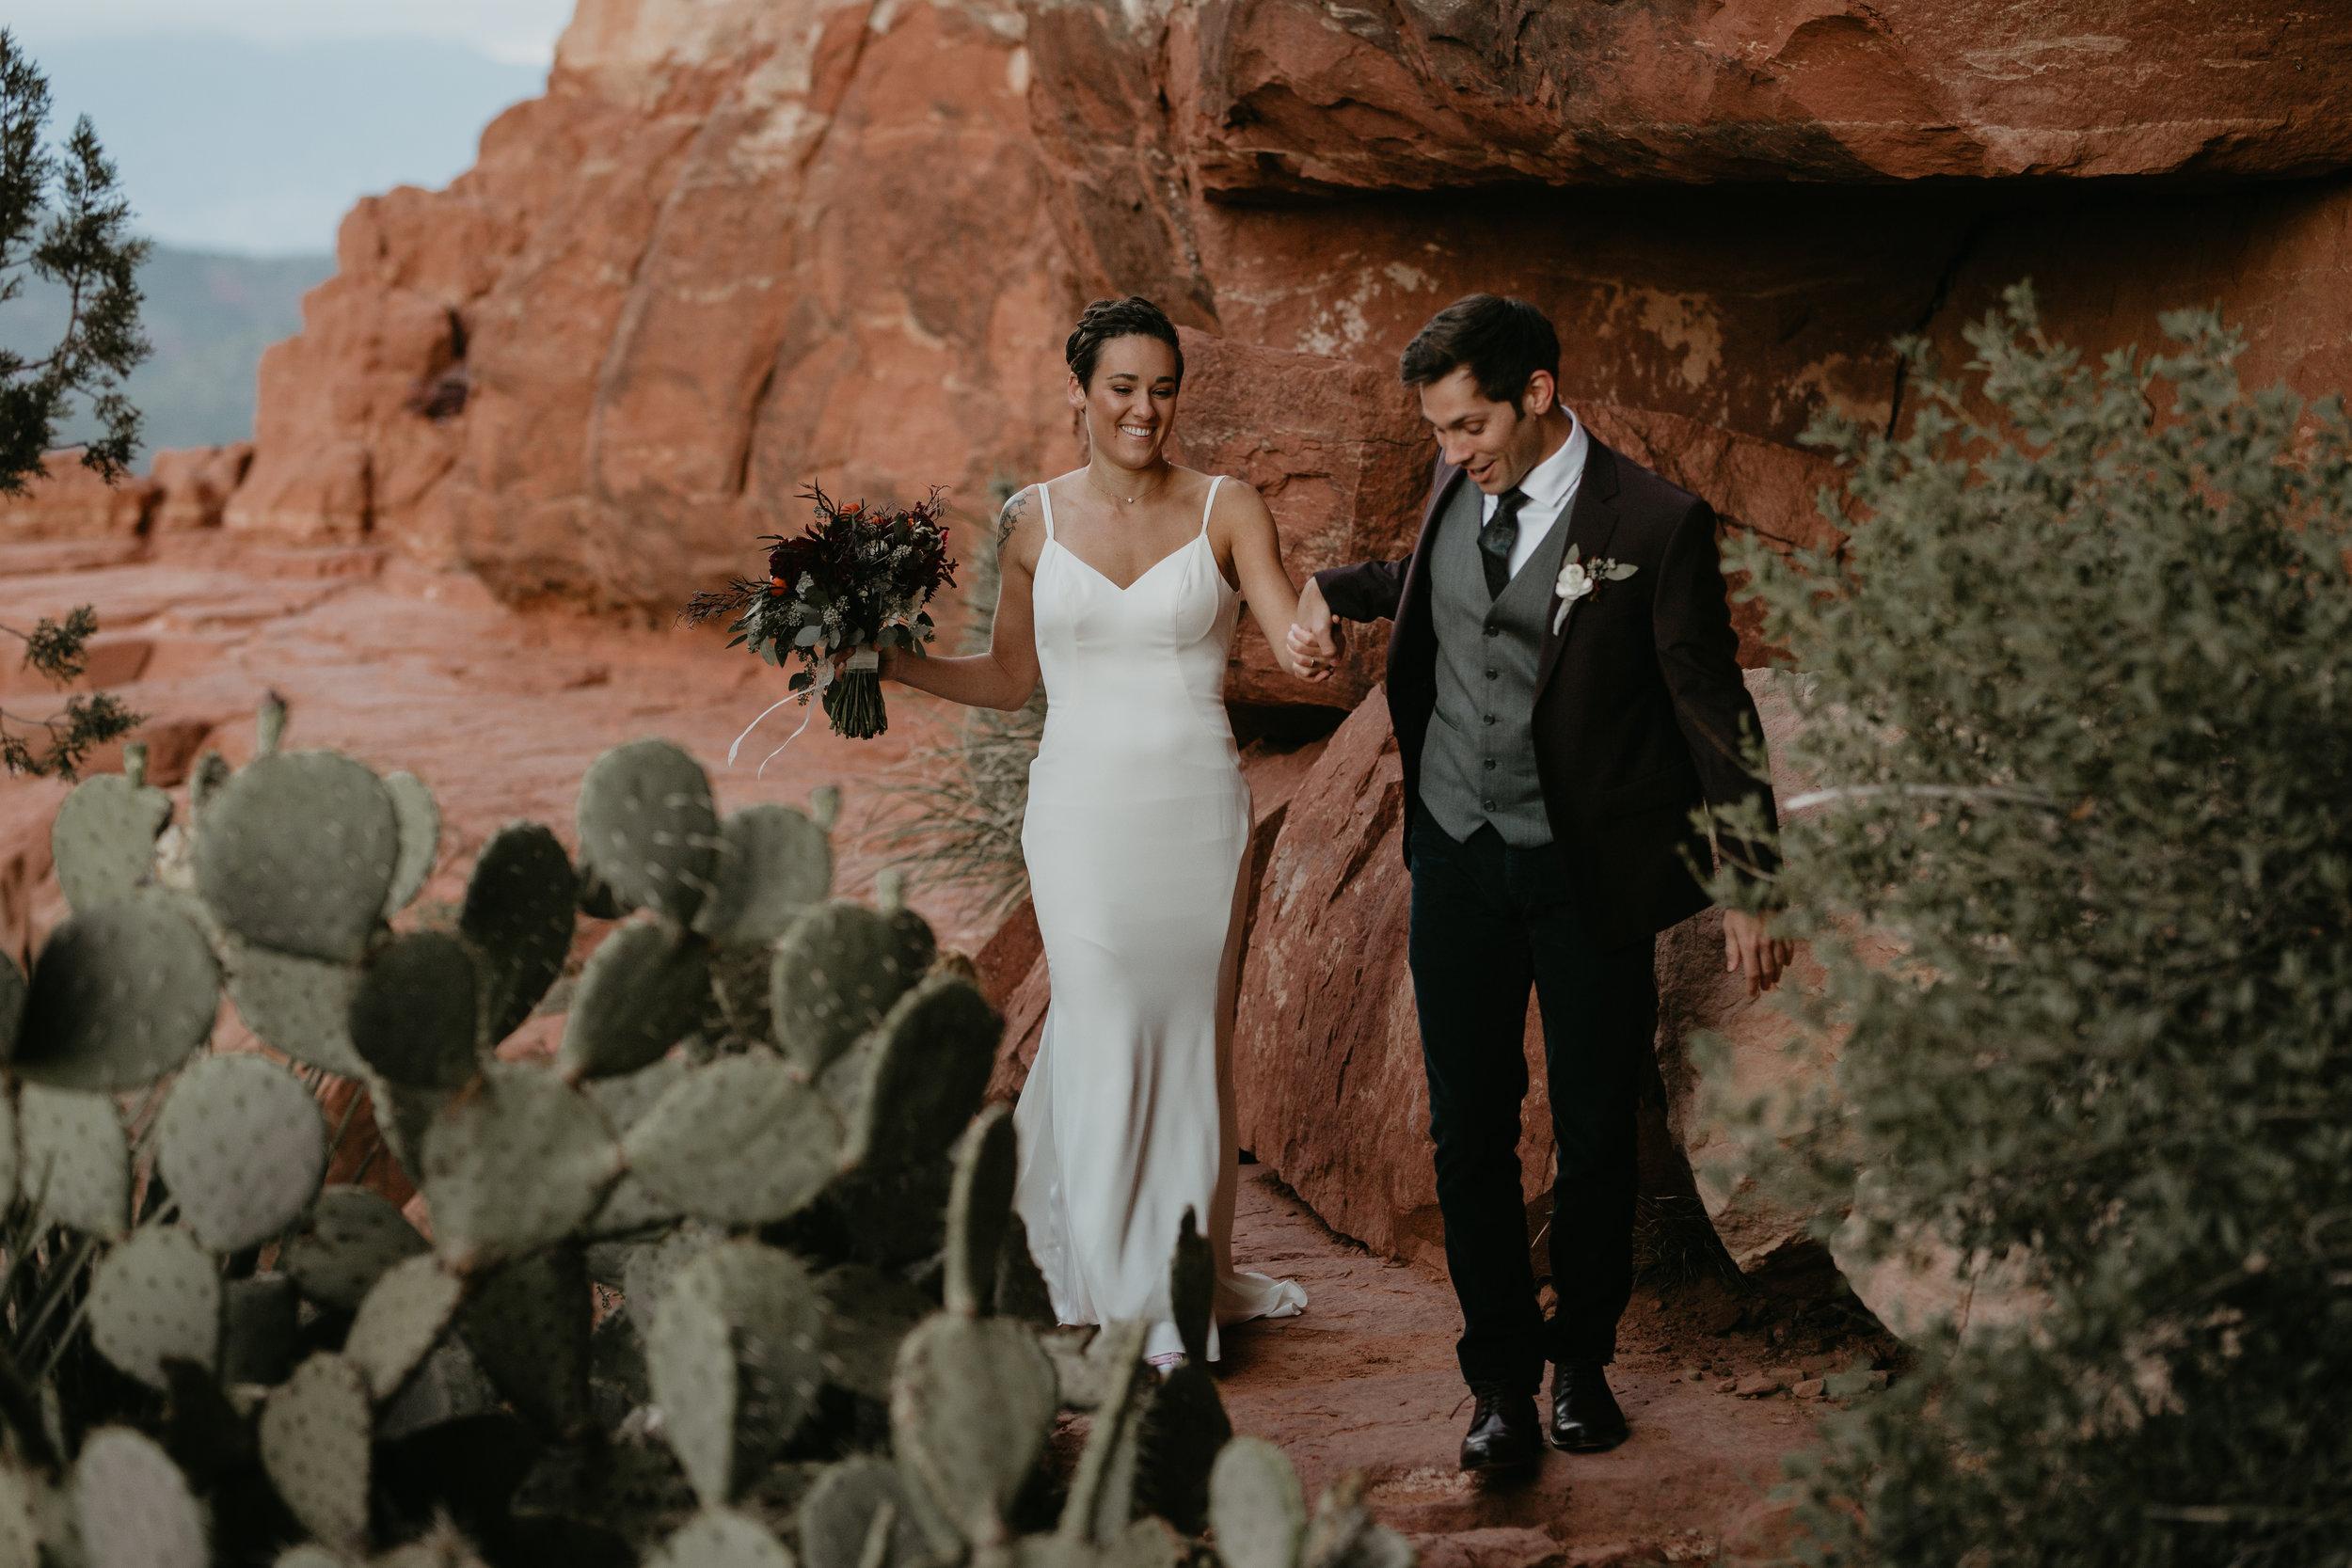 nicole-daacke-photography-sedona-arizona-destination-elopement-wedding-photographer-catherdral-rock-hiking-elopement-sedona-river-elopement-photos-desert-rock-wedding-photographer-laid-back-spontaneous-elopement-24.jpg